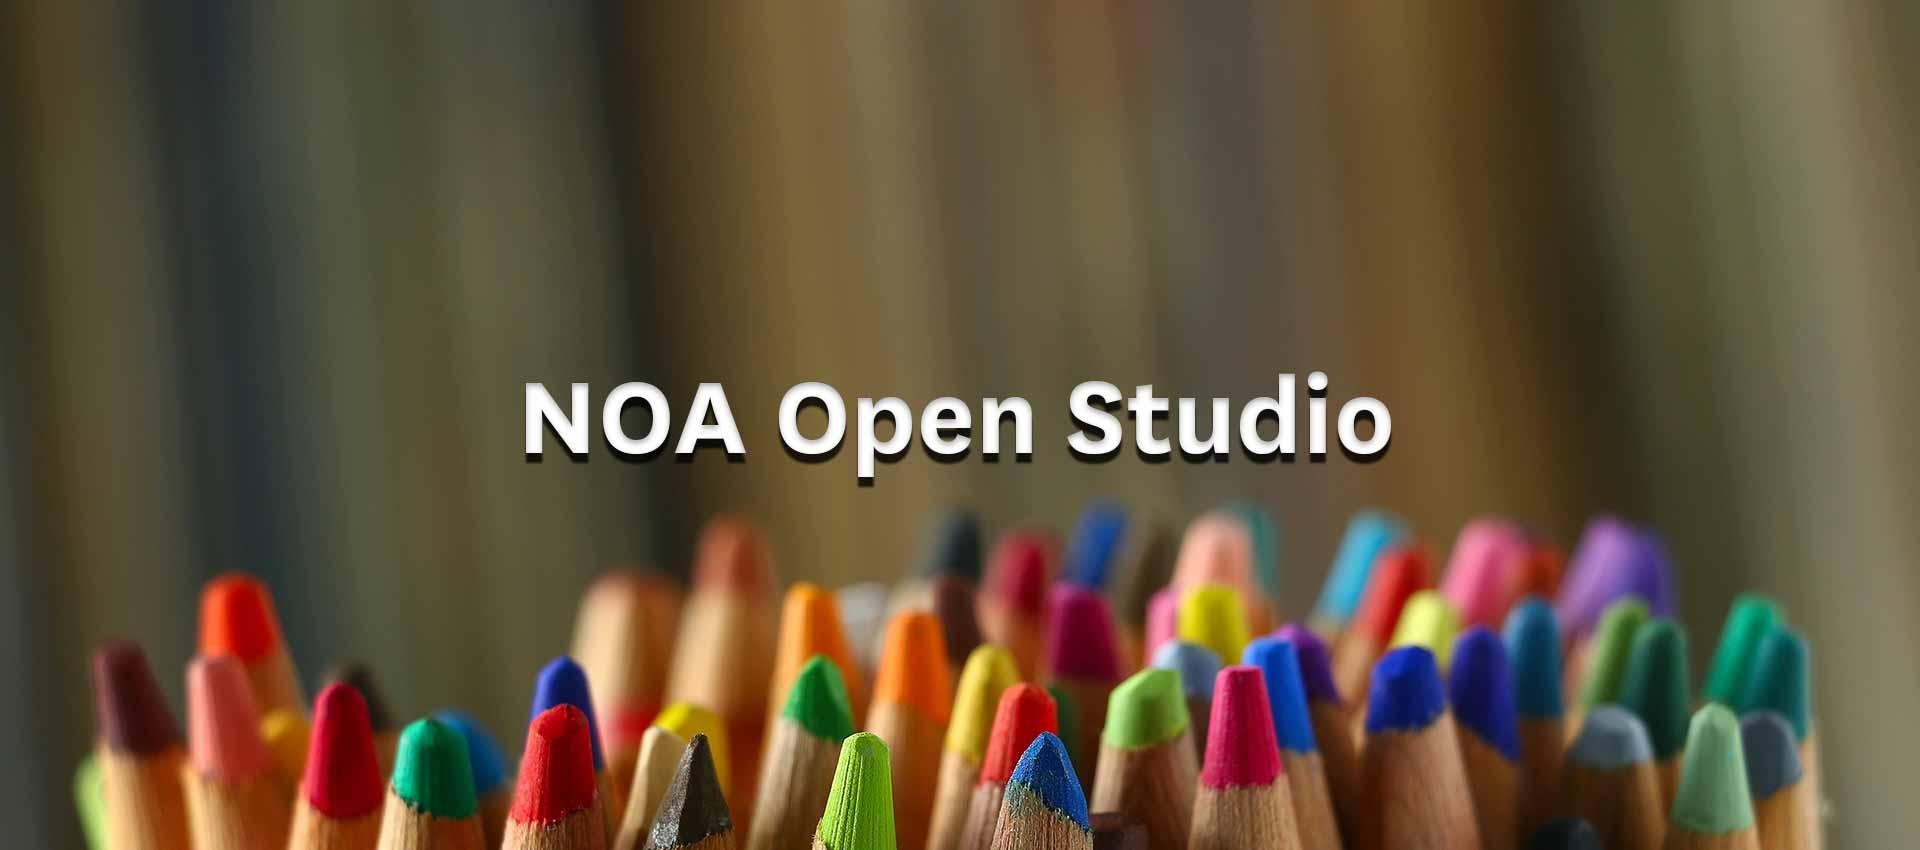 https://www.temanawa.co.nz/wp-content/uploads/2021/03/NOA-Open-Studio.jpg